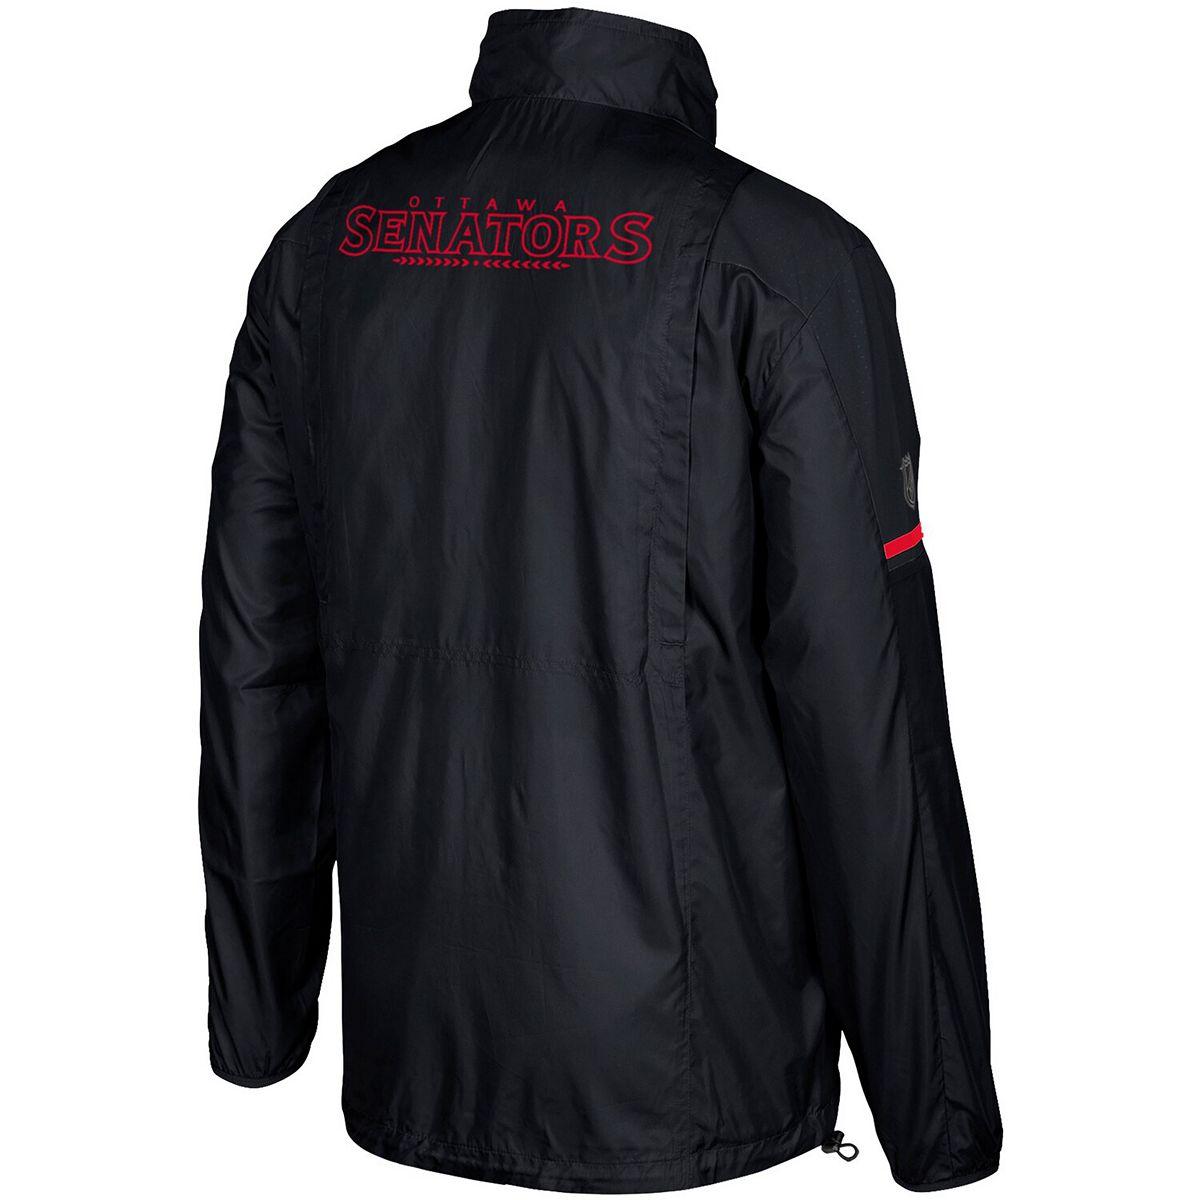 Men's adidas Black Ottawa Senators Authentic Rink Full-Zip Jacket dE7K8